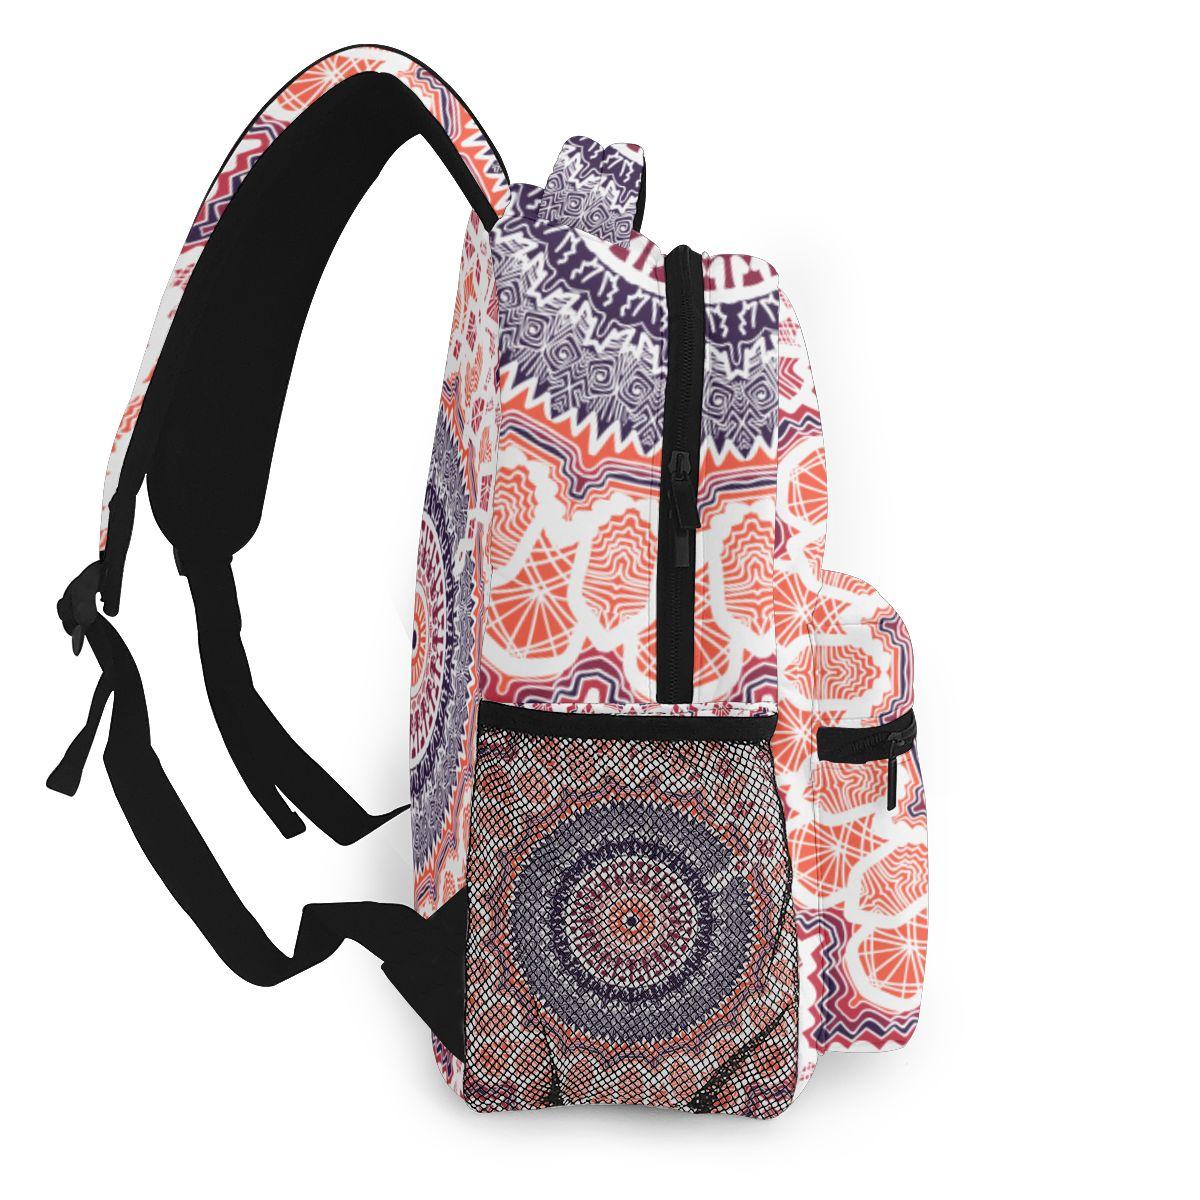 Indian Chief Logo Bag Unisex Leisure School Leisure Shoulder Backpack